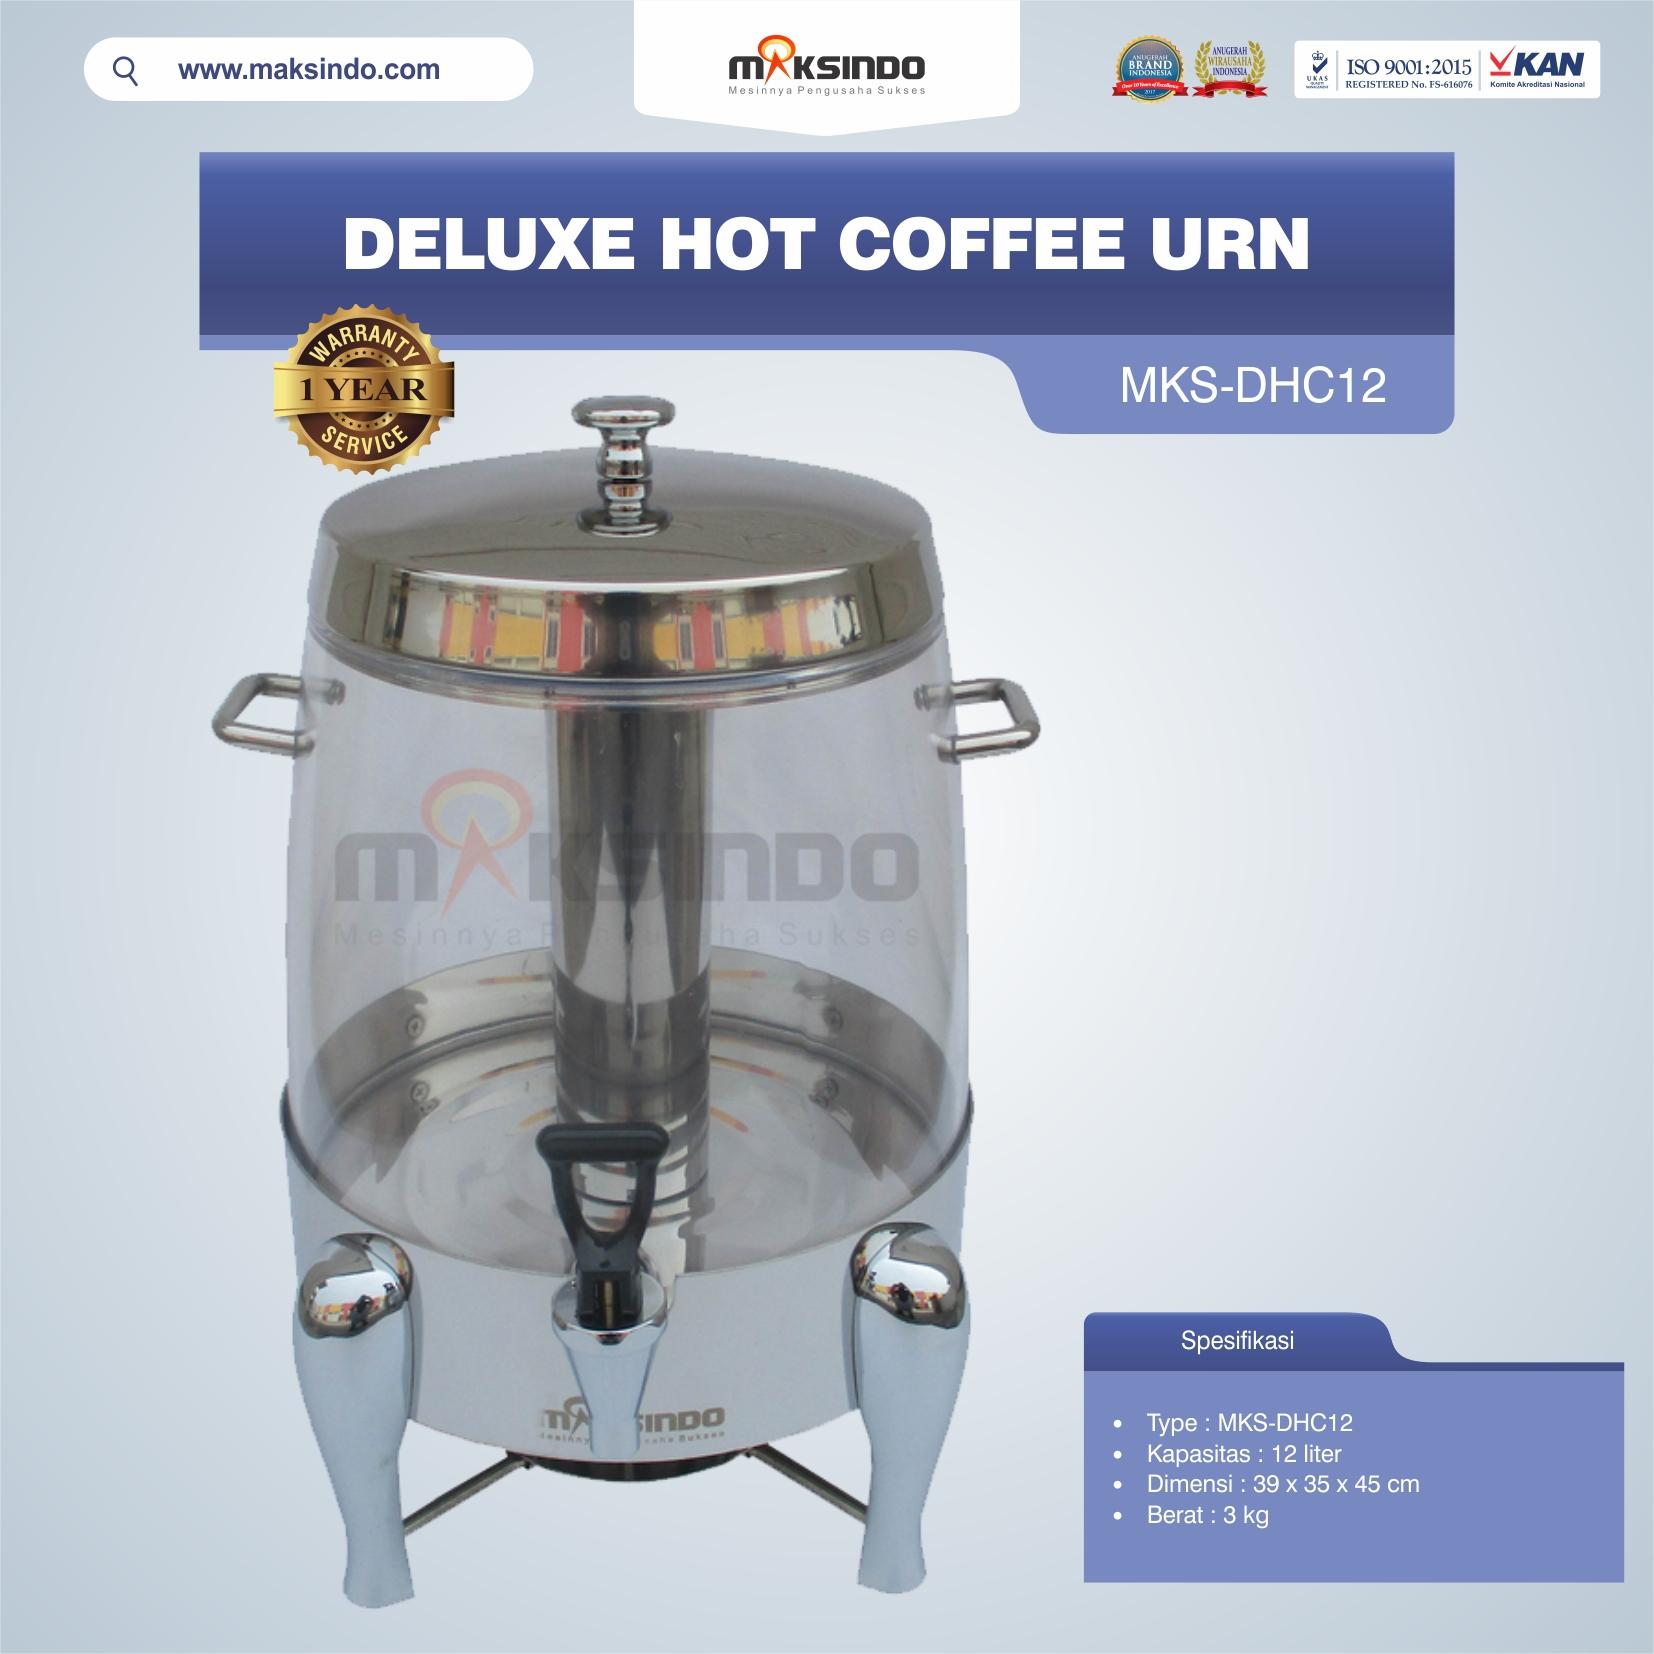 Jual Deluxe Hot Coffee Urn MKS-DHC12 di Yogyakarta